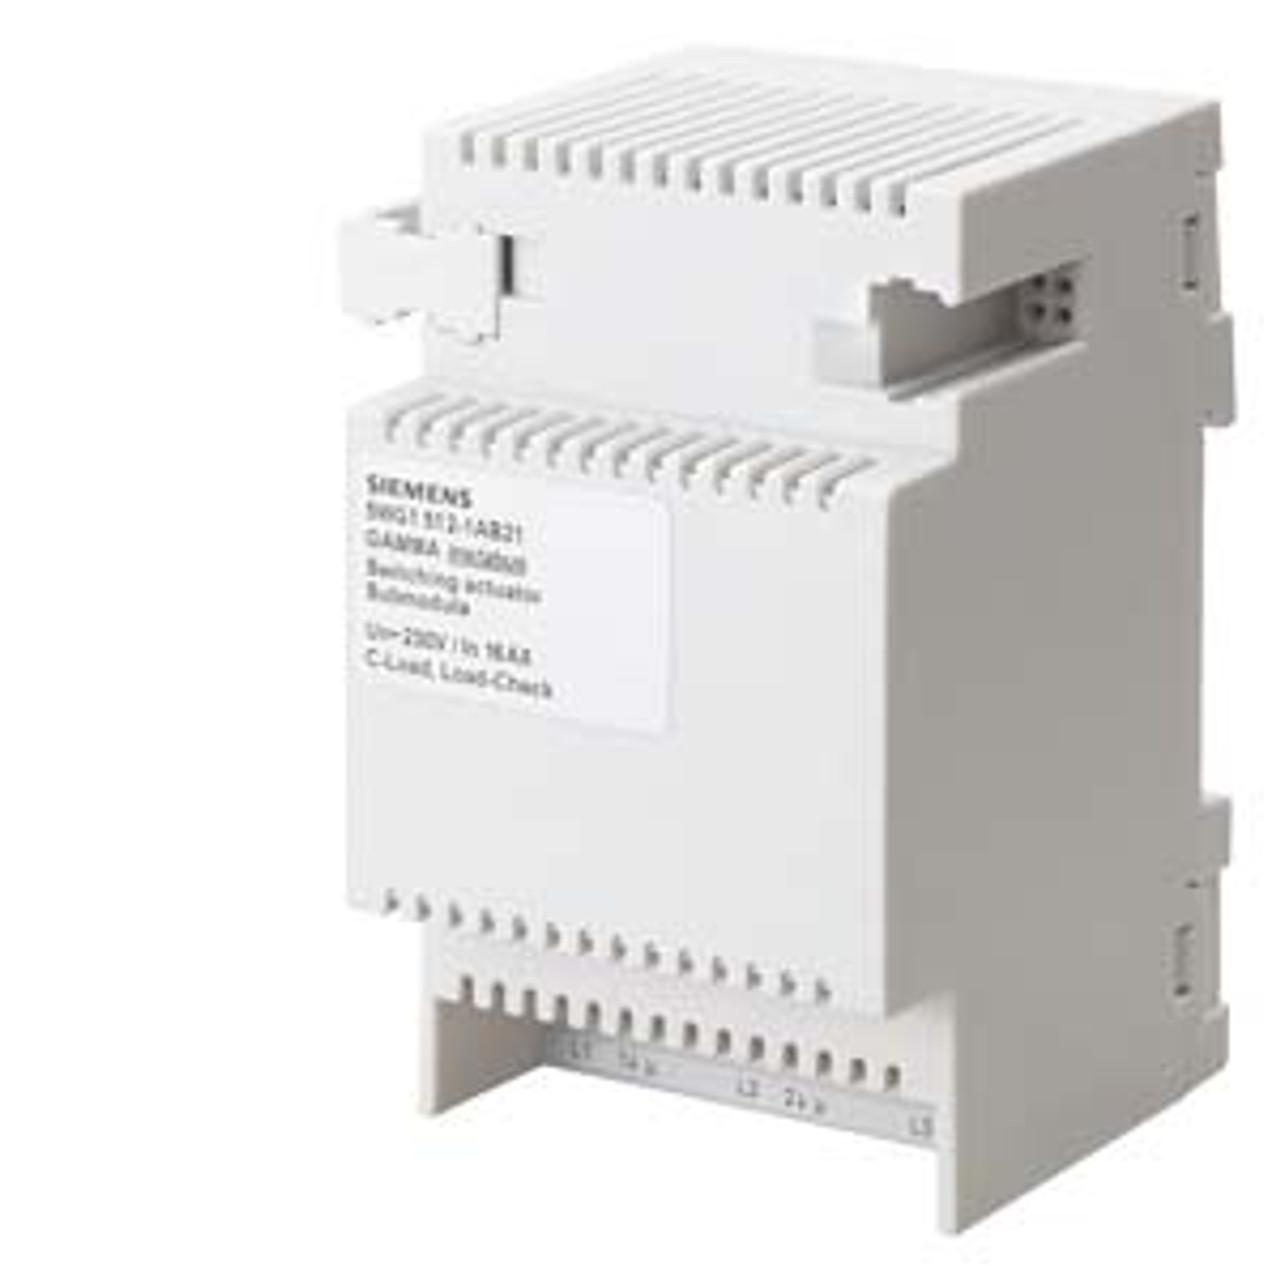 Siemens 5WG1512-1AB21